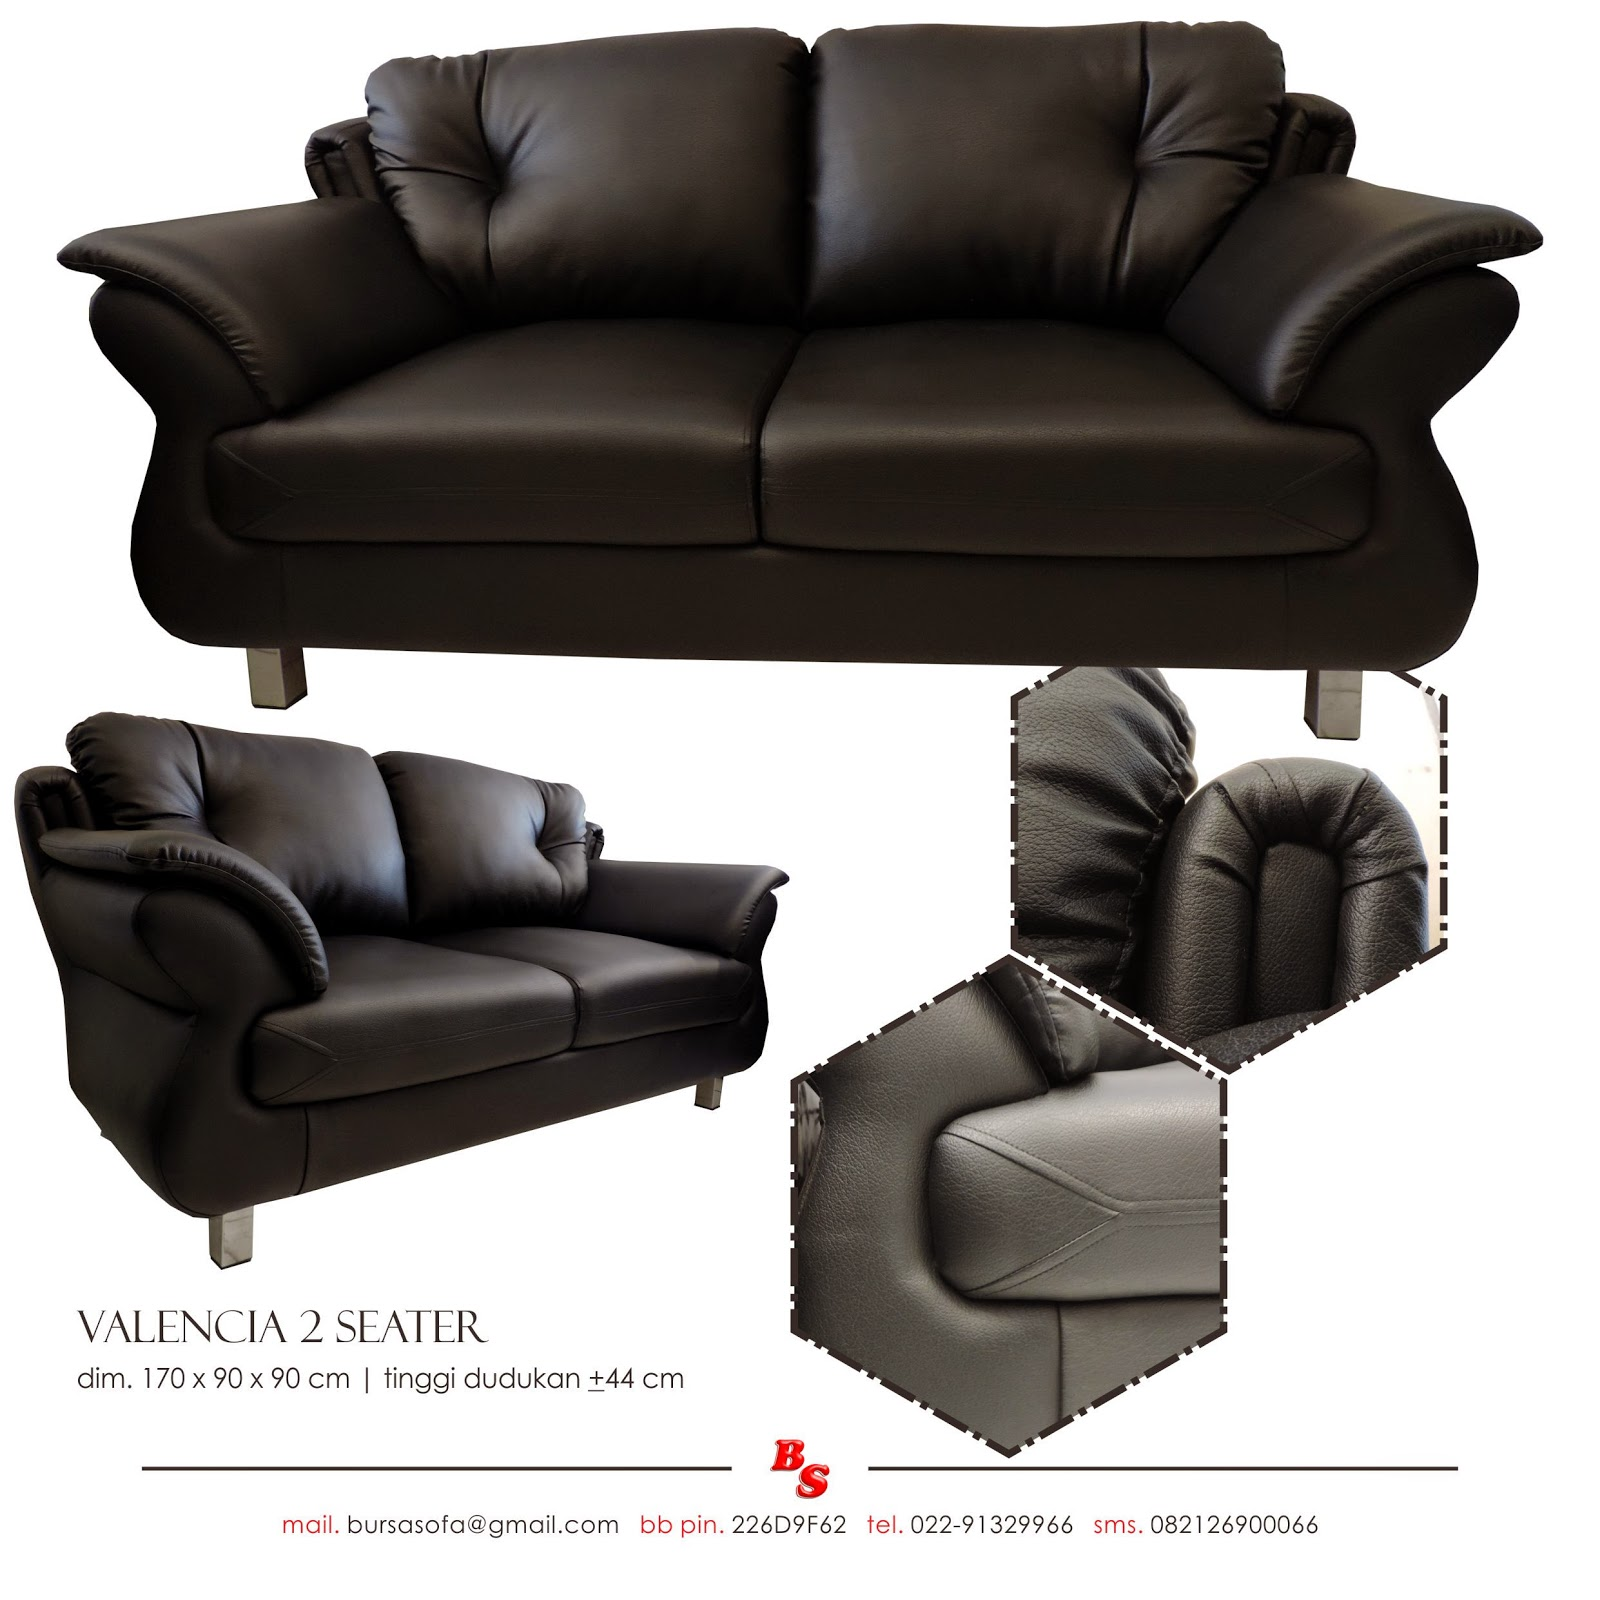 Outstanding Bursa Sofa Sofa Set Valencia Ibusinesslaw Wood Chair Design Ideas Ibusinesslaworg